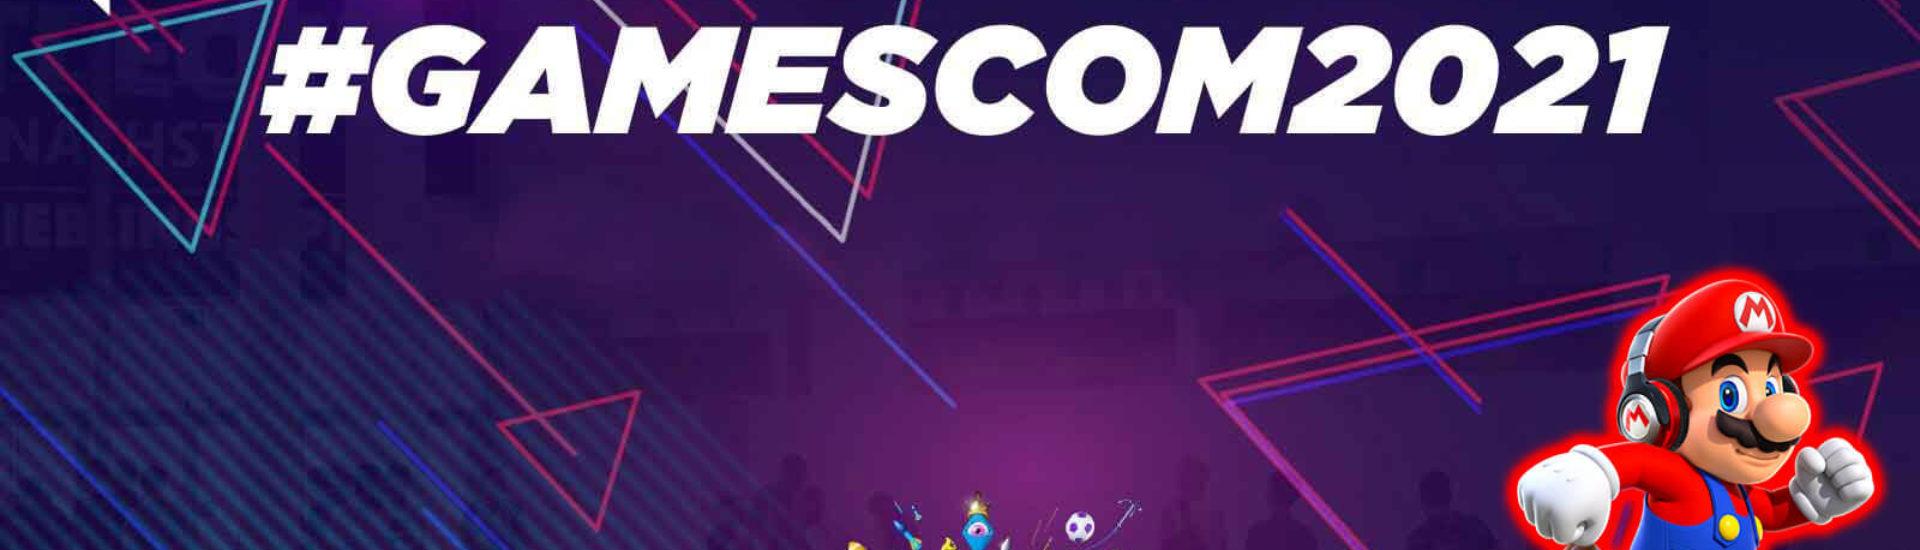 Gamescom 2021: Nintendo sagt die Messe ab